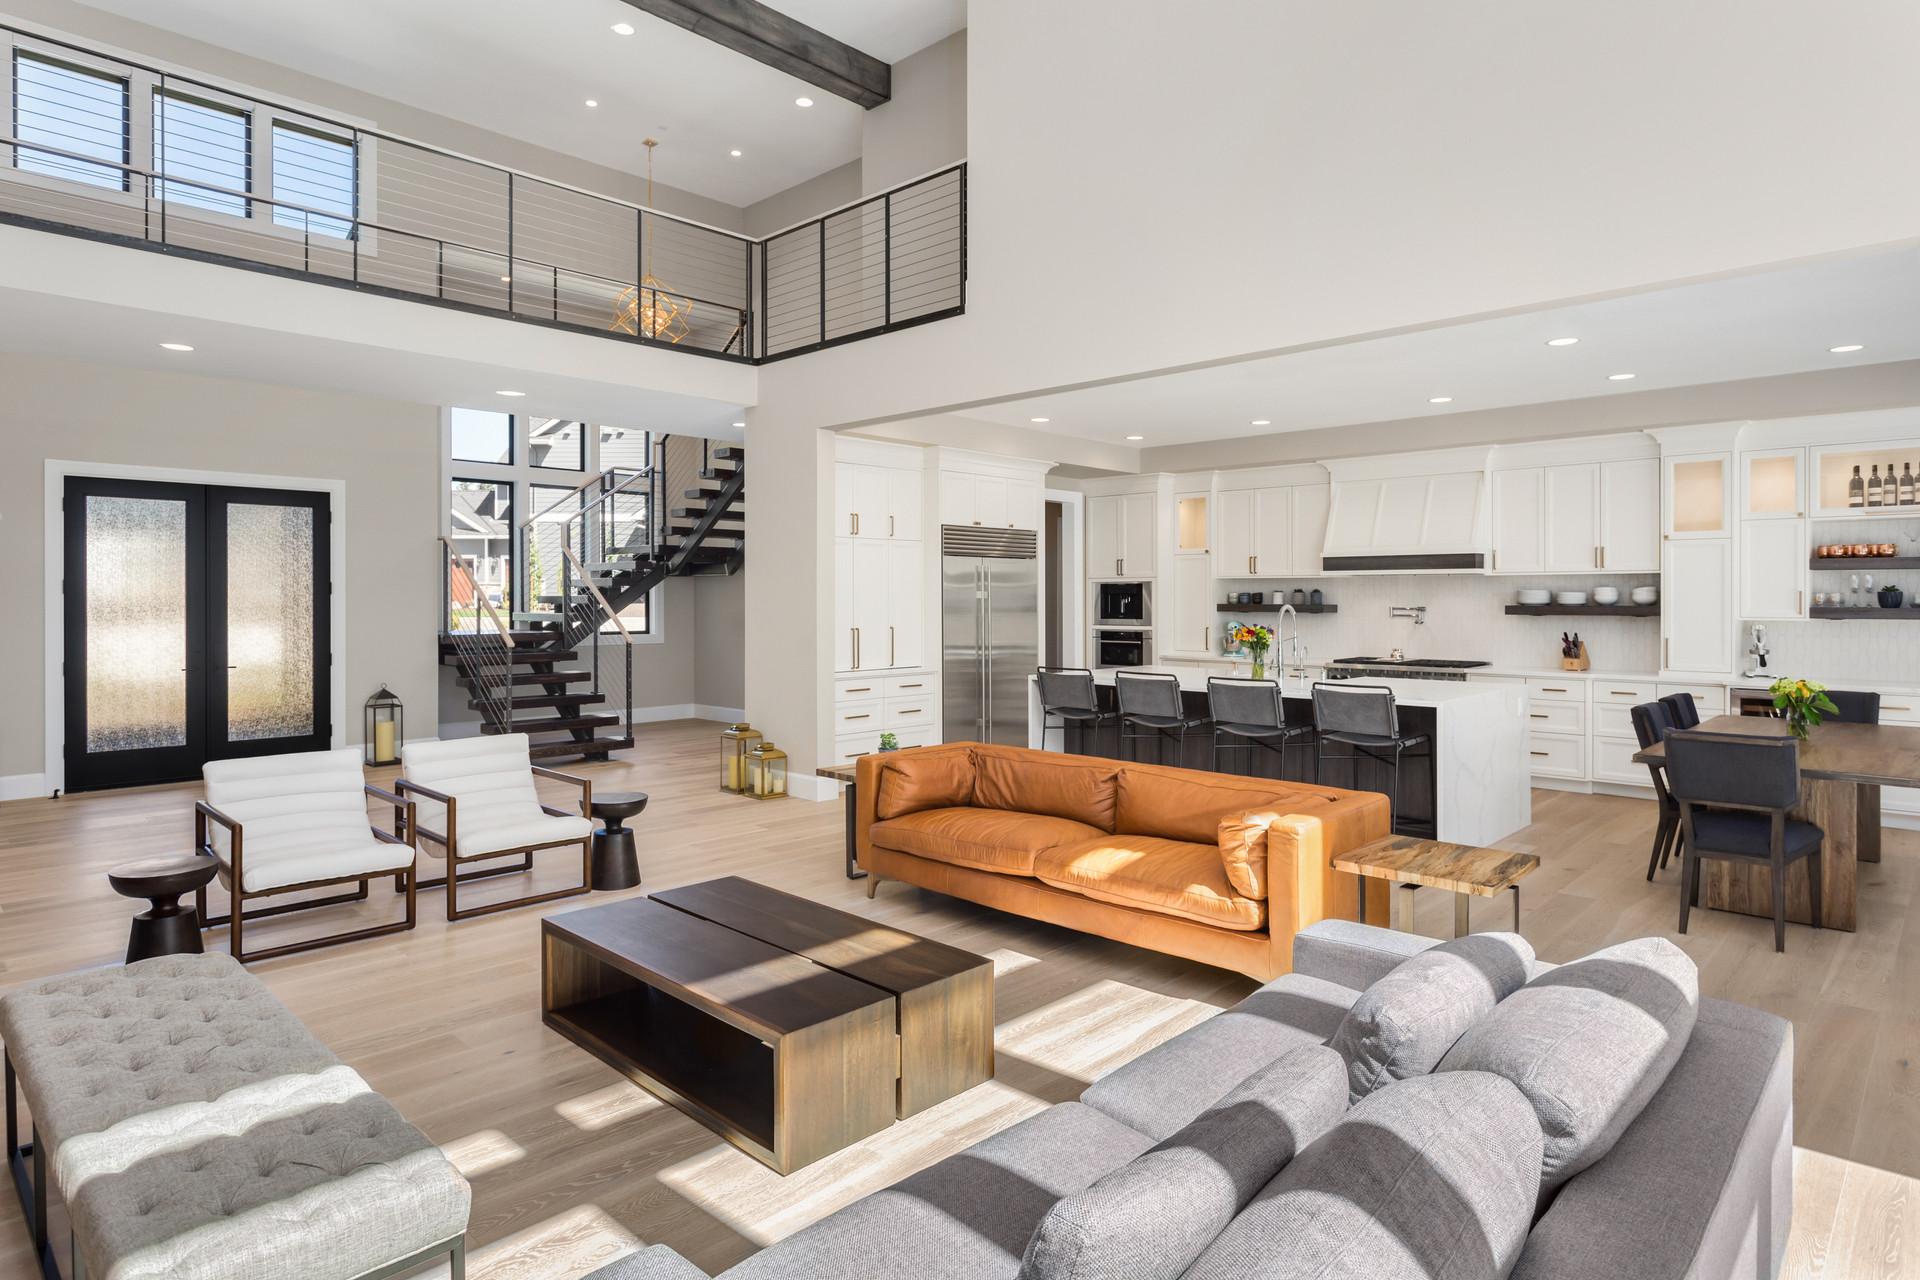 Living Room in Open Concept New Luxury